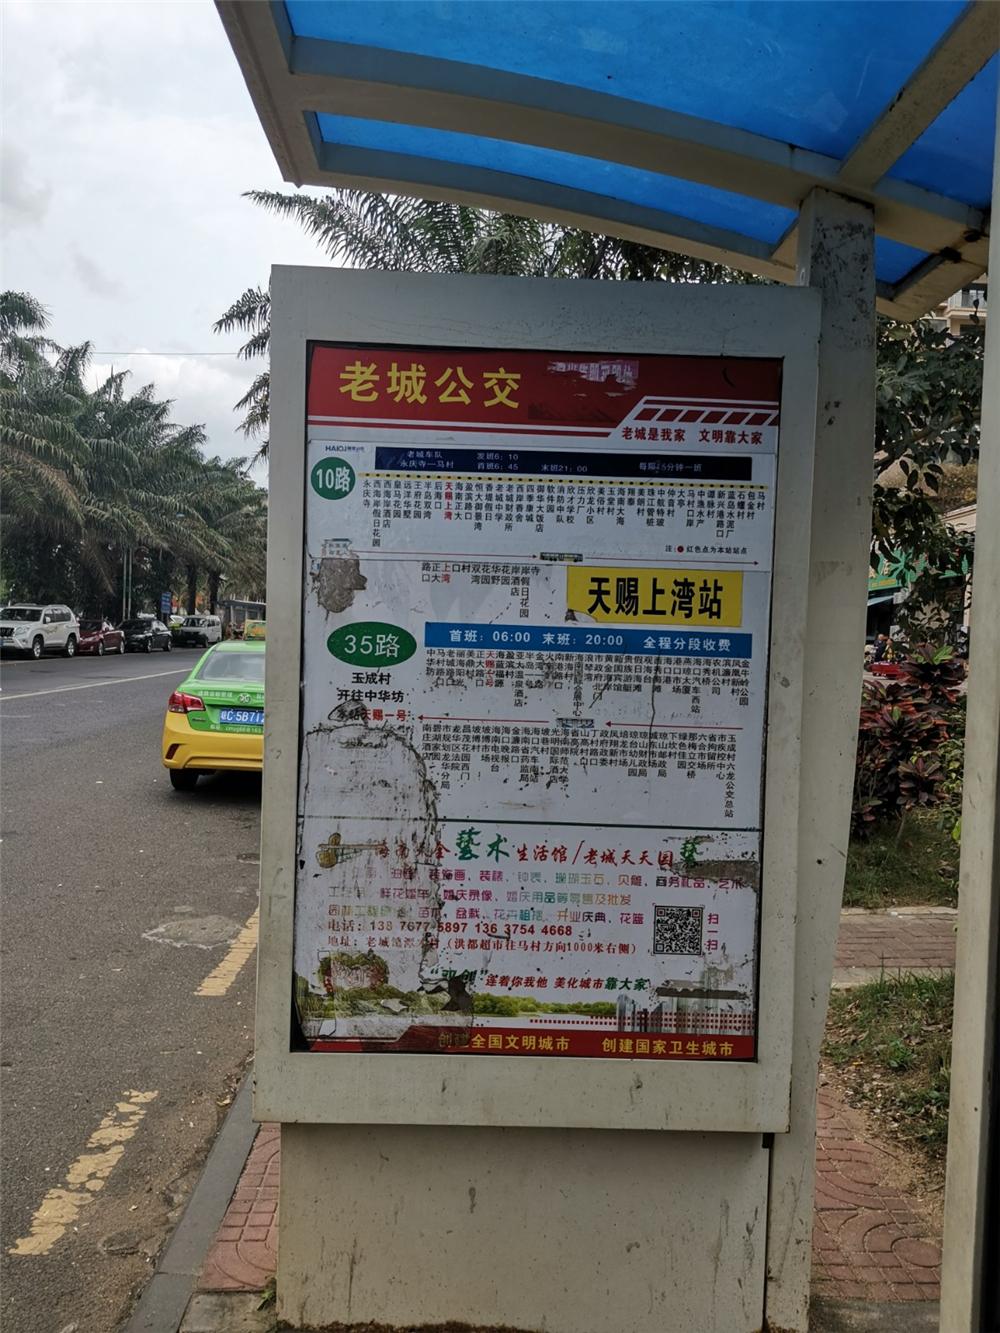 http://yuefangwangimg.oss-cn-hangzhou.aliyuncs.com/uploads/20191030/17eeaf937f0177734f87d426cdbff008Max.jpg